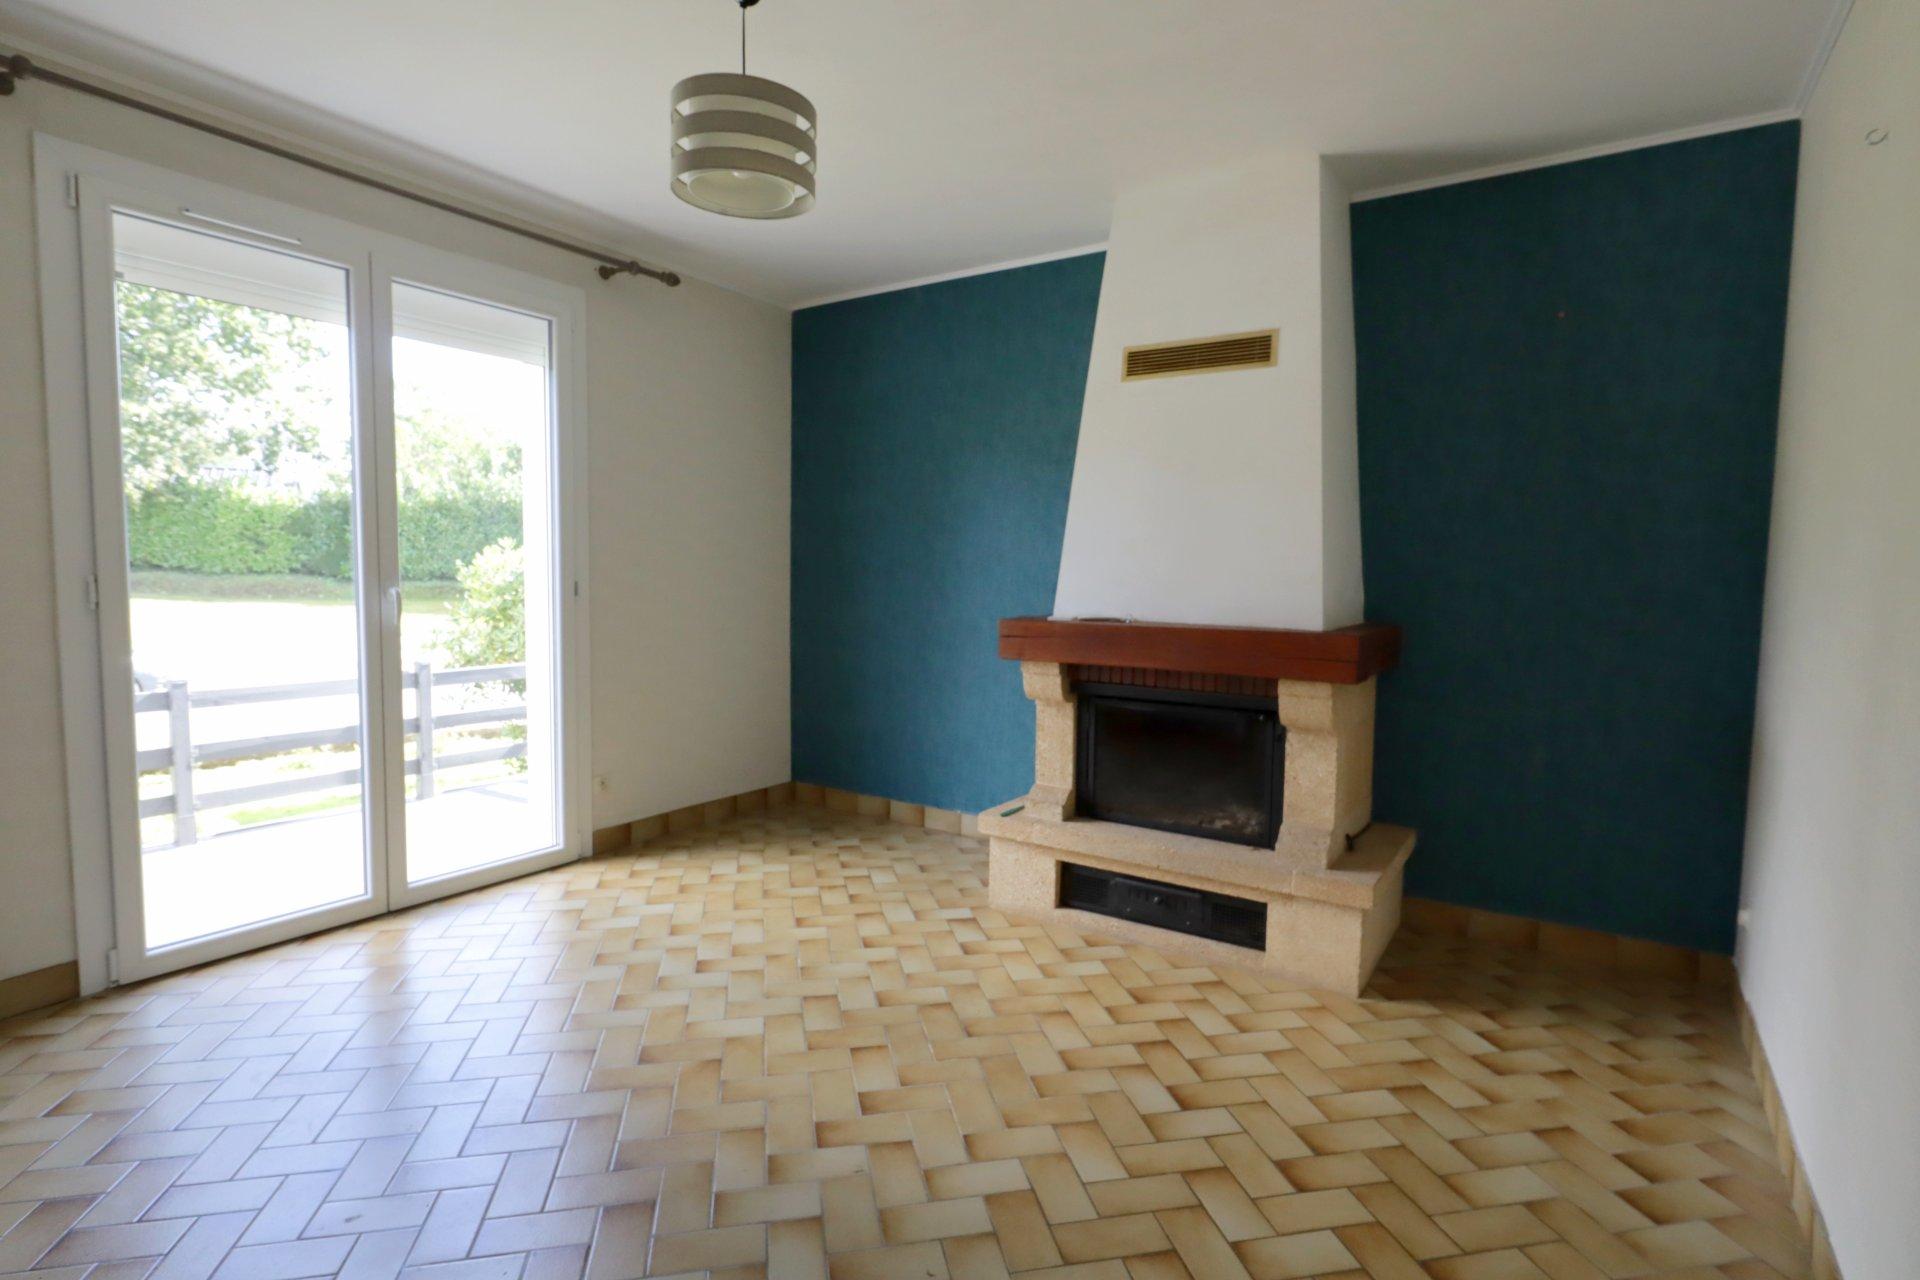 MAEL-CARHAIX 22 :  Maison rénovée